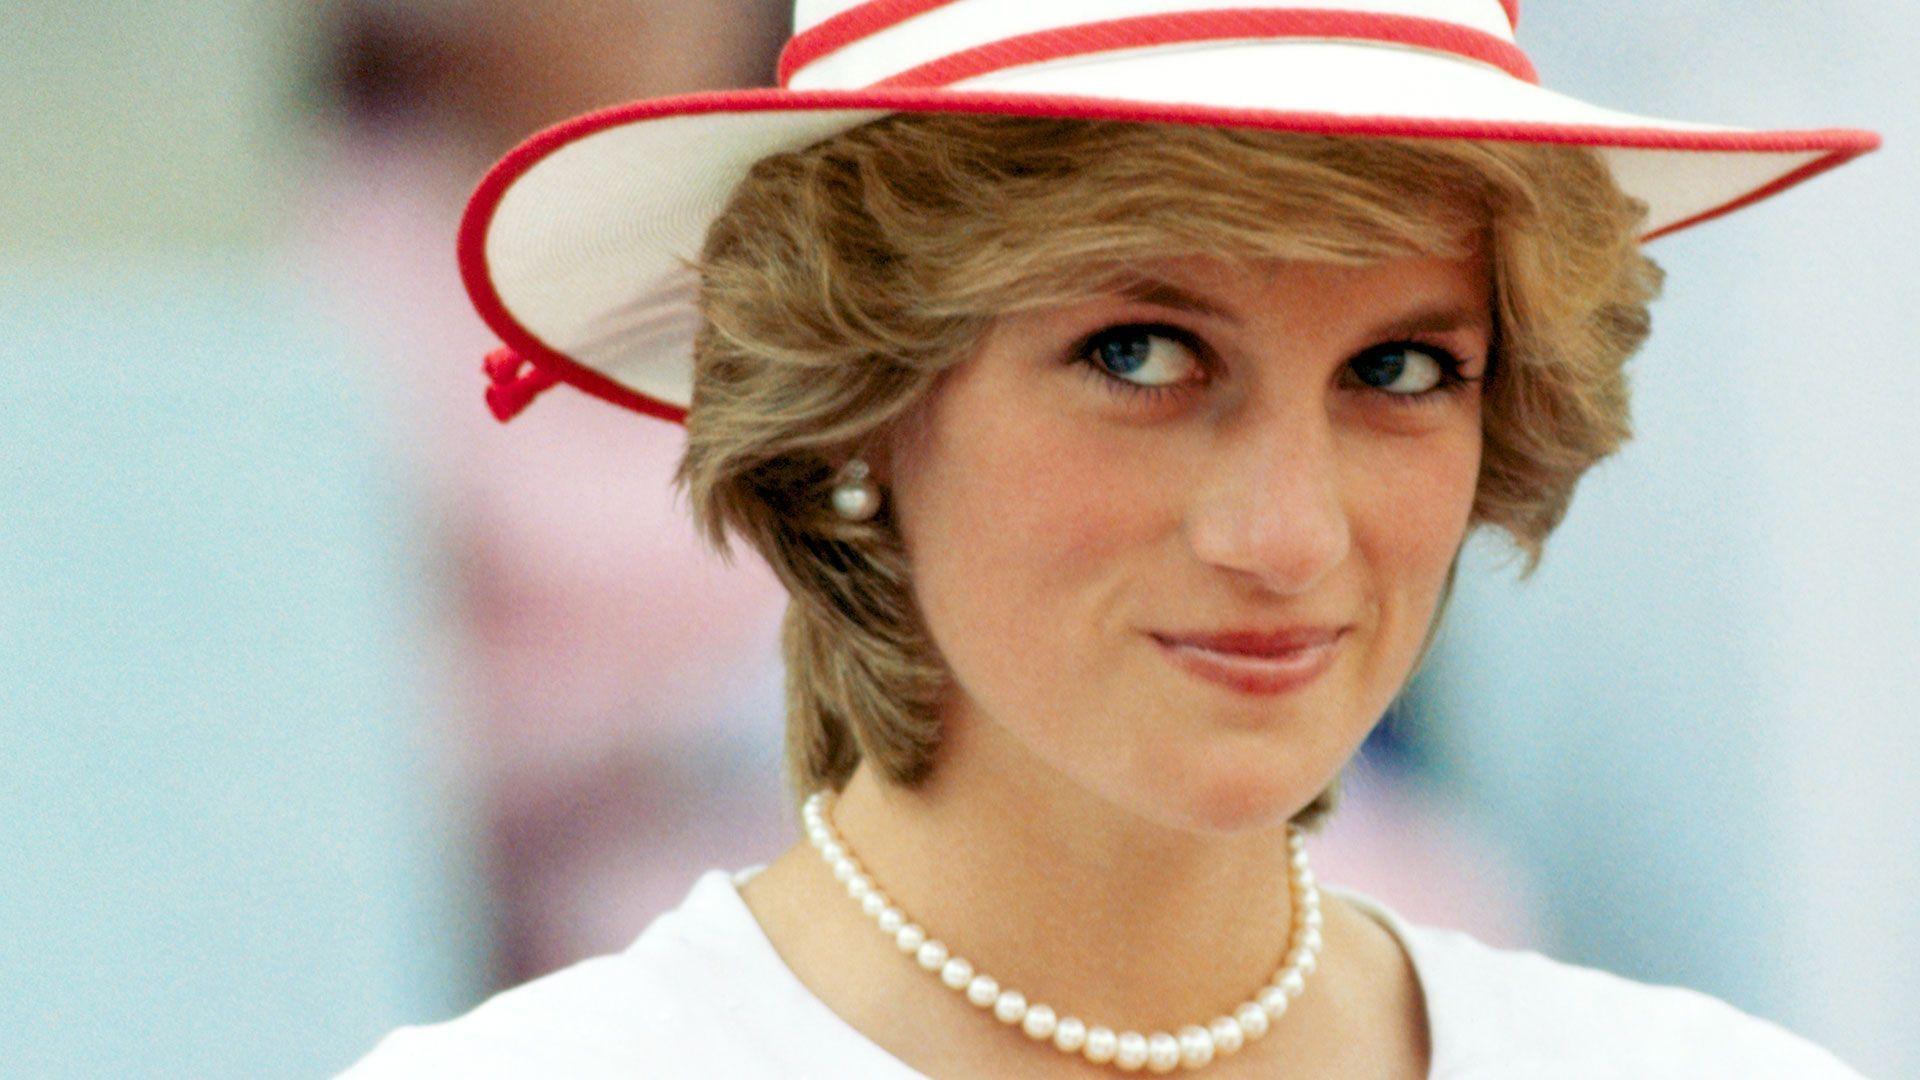 Archivbild: Lady Diana